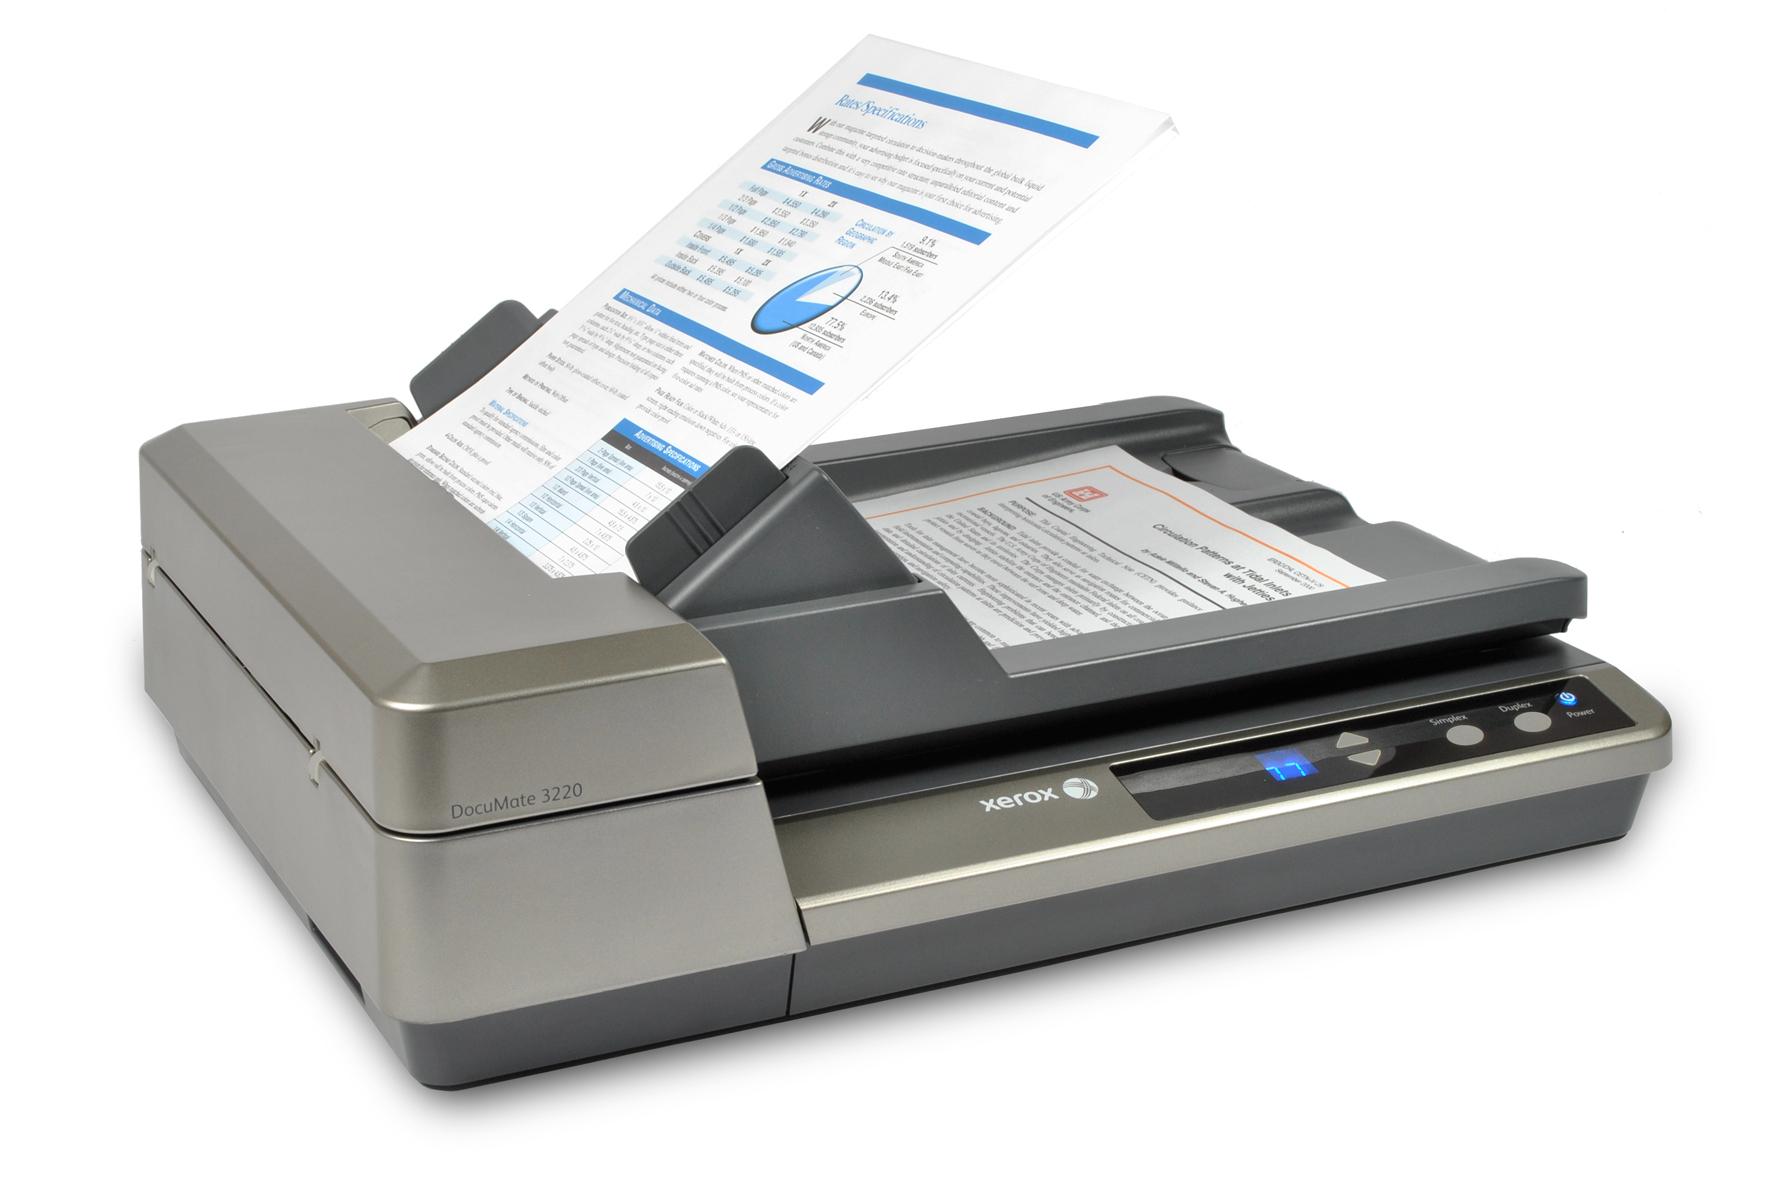 Documate 3220 Scanner 23ppm/46ipm@200dpi Duplex A4, 600dpi, USB2.0